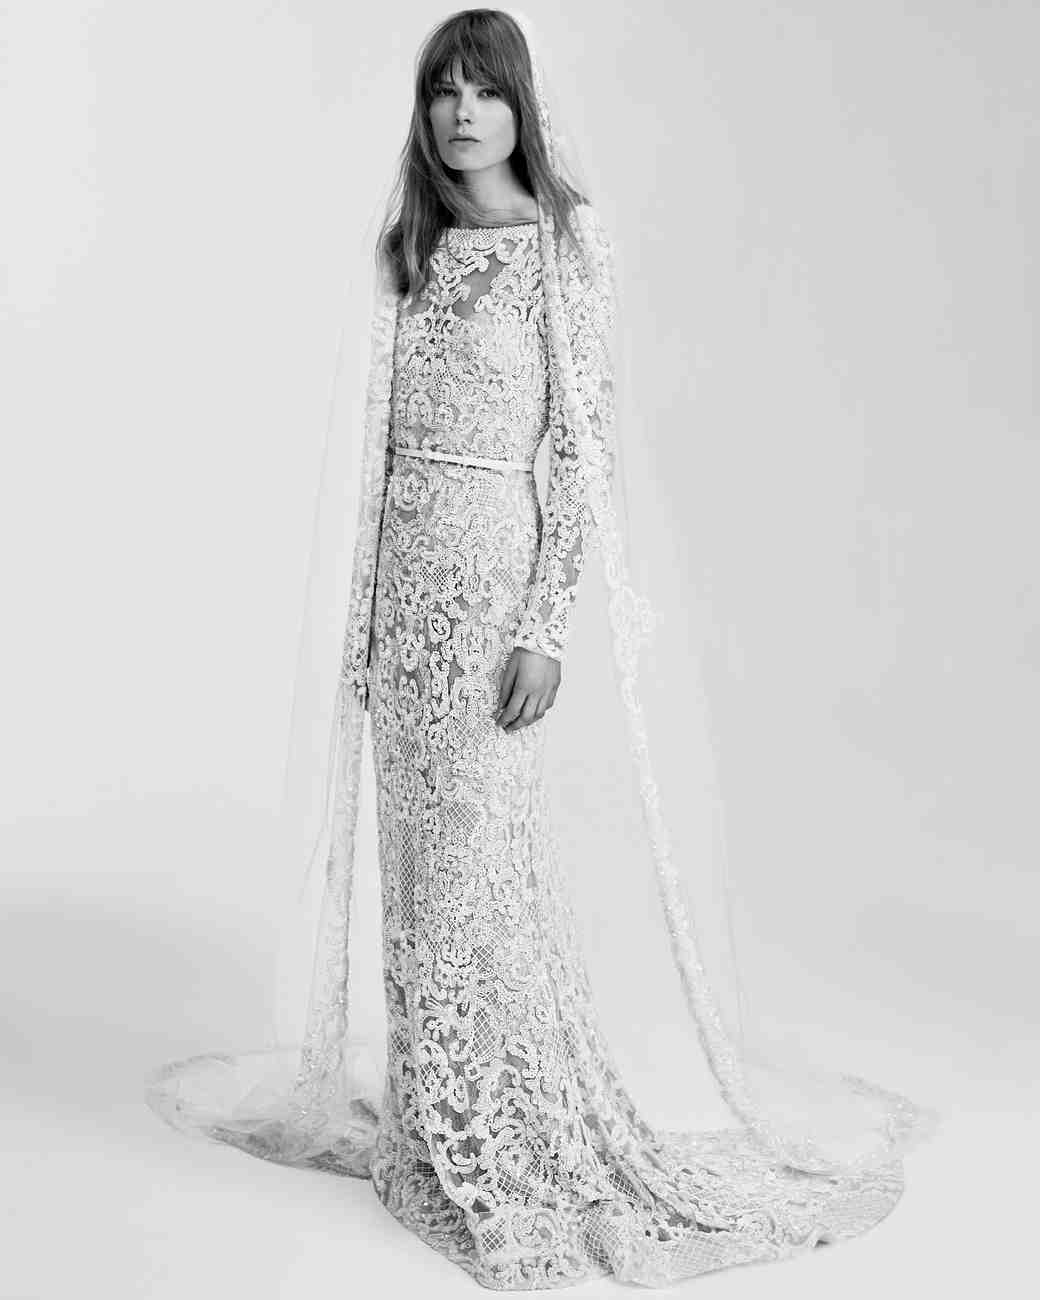 elie saab wedding dresses spring elie saab wedding dress Elie Saab Spring Wedding Dress Collection Martha Stewart Weddings